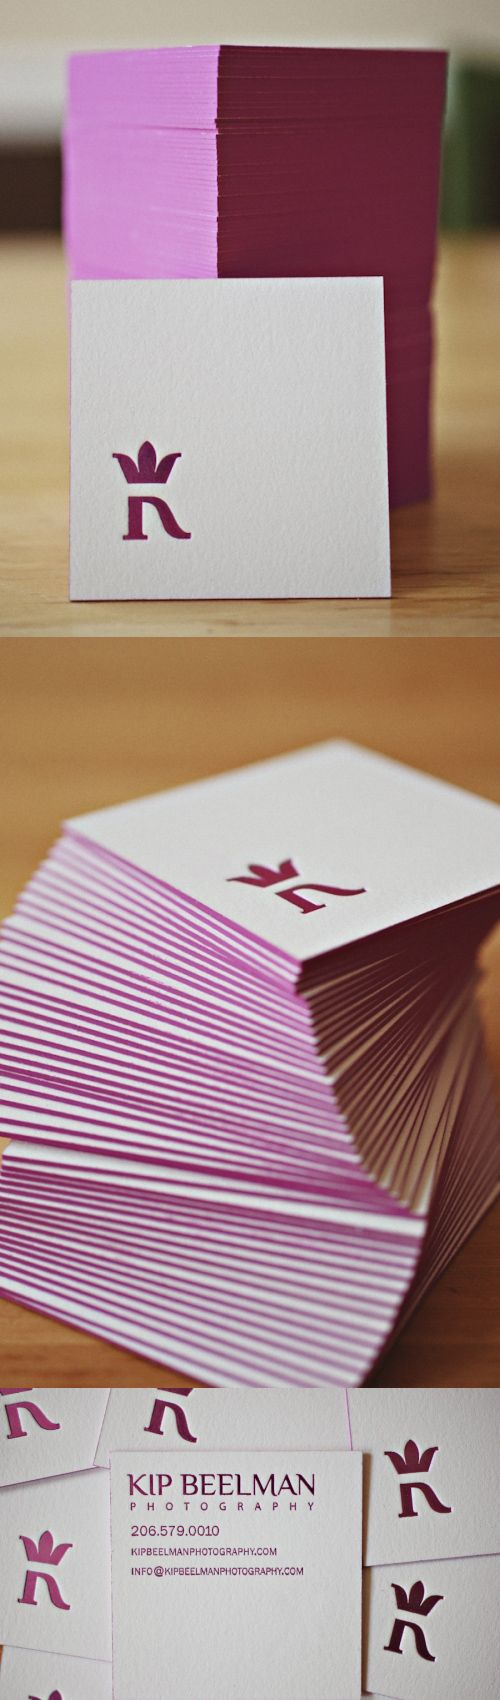 Beautiful Square Letterpress.  Super thick with a deep raspberry pink foil.  #design #inspiration #letterpress